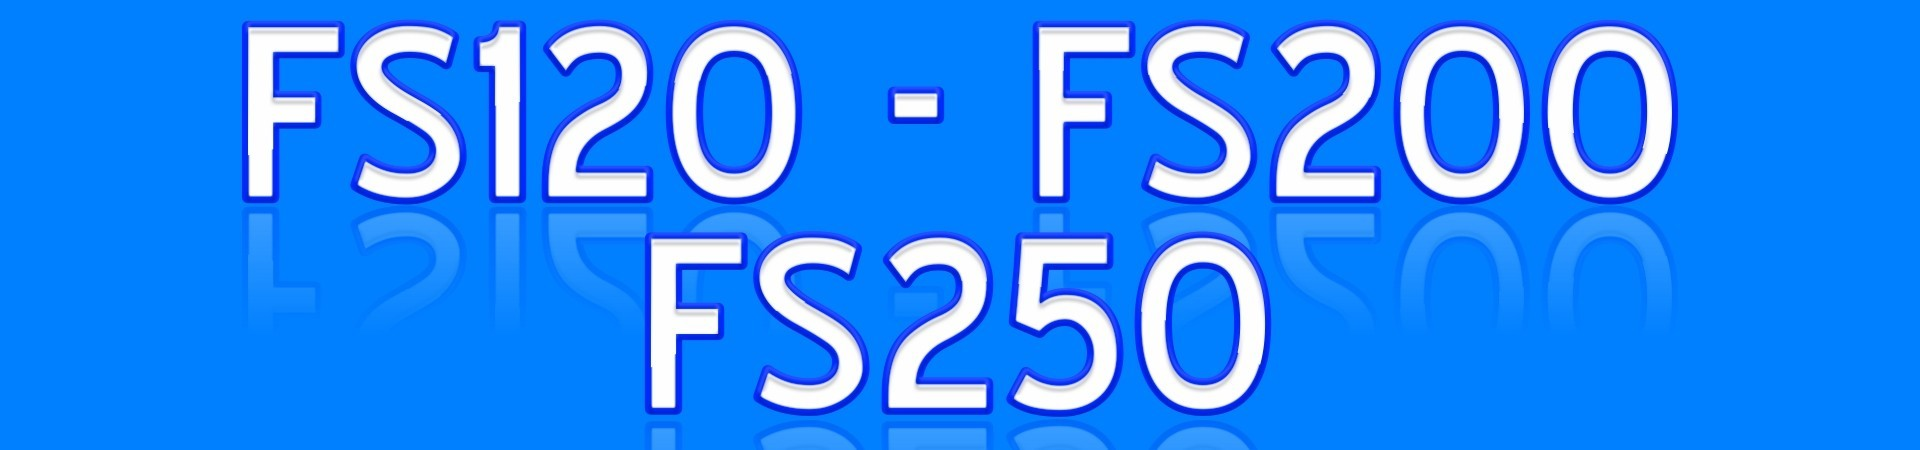 REPUESTOS para Desbrozadora STIHL FS120 FS200 FS250